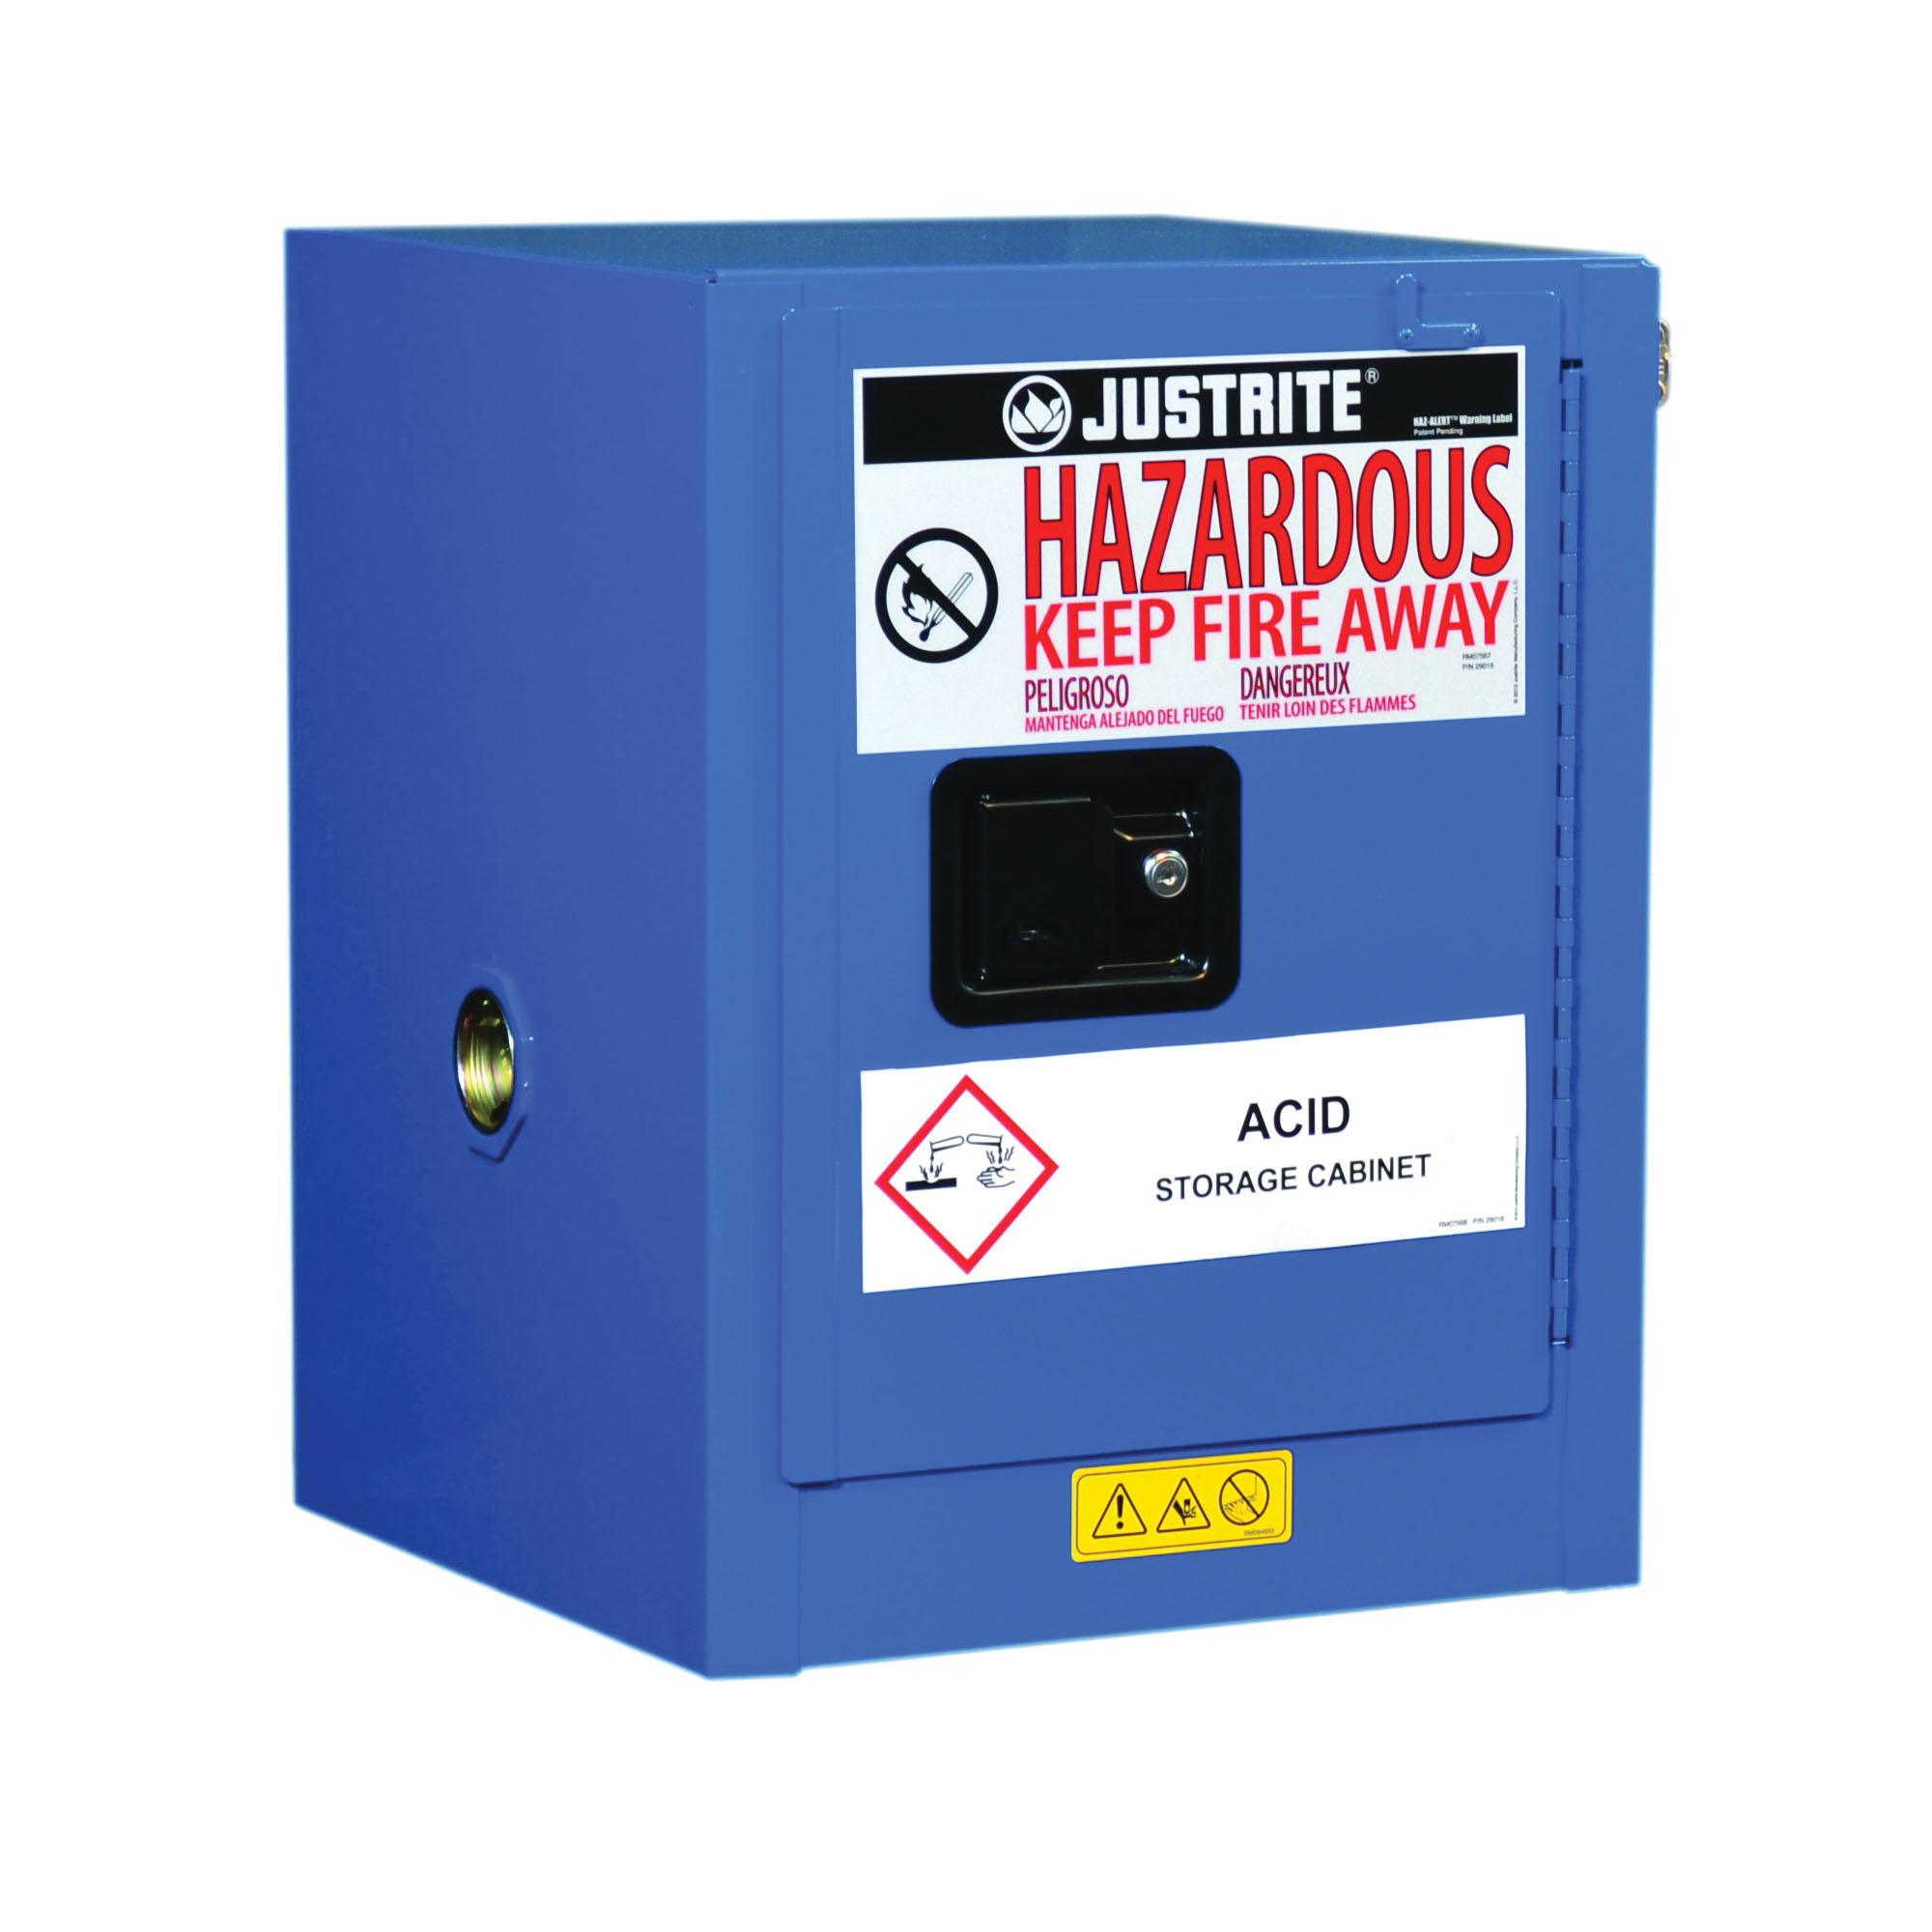 Justrite® 8604282 ChemCor® Countertop Corrosive Safety Cabinet, 4 gal Capacity, U-Loc™ Handle, 22 in H x 17 in W x 17 in D, Self-Close Door, 1 Door, 1 Shelve, 18 ga Cold Rolled Steel, Royal Blue